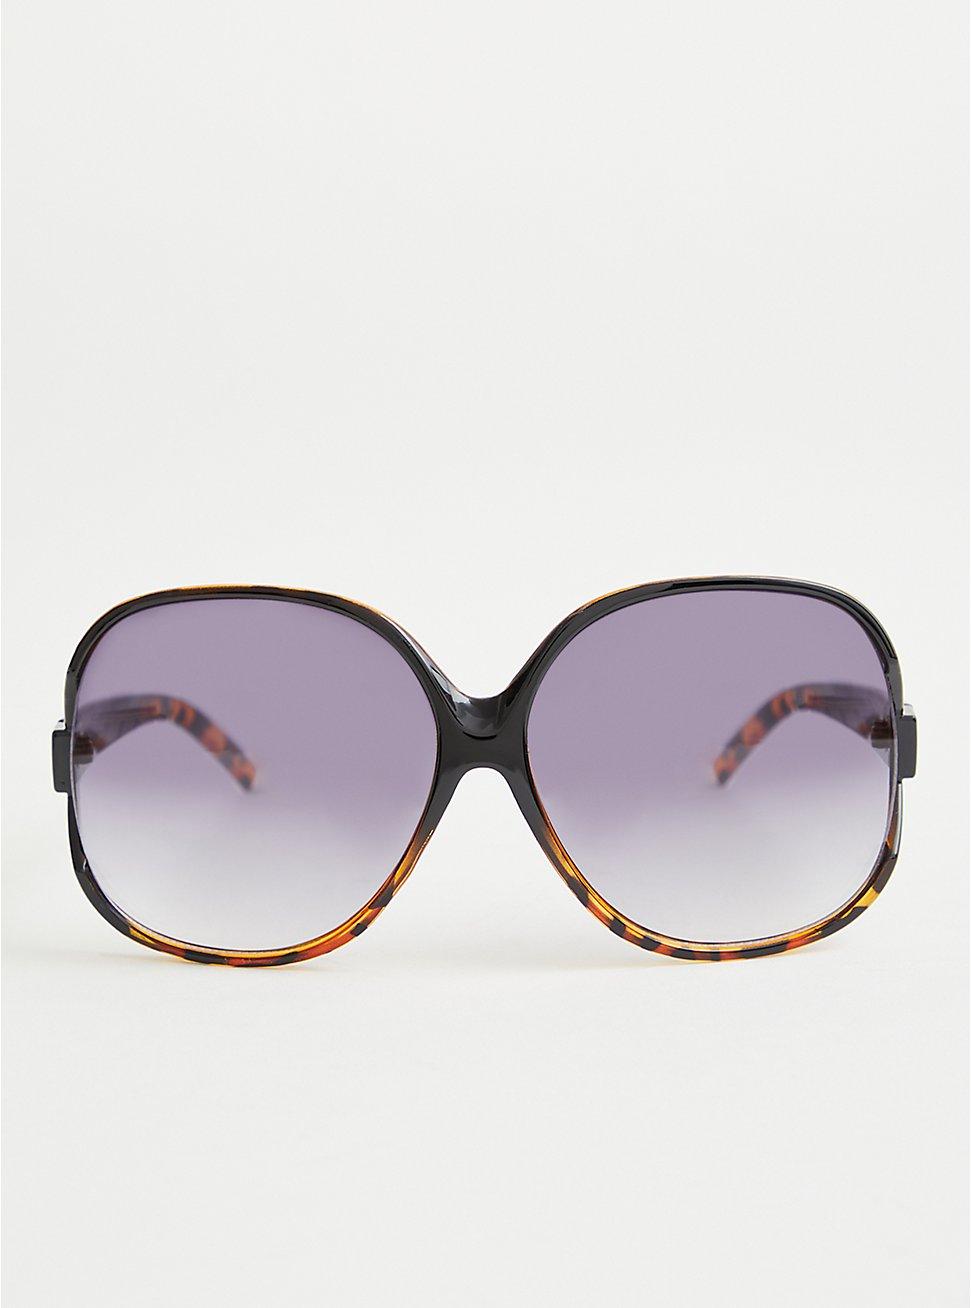 Black and Tortoise Fade Oversized Sunglasses, , hi-res